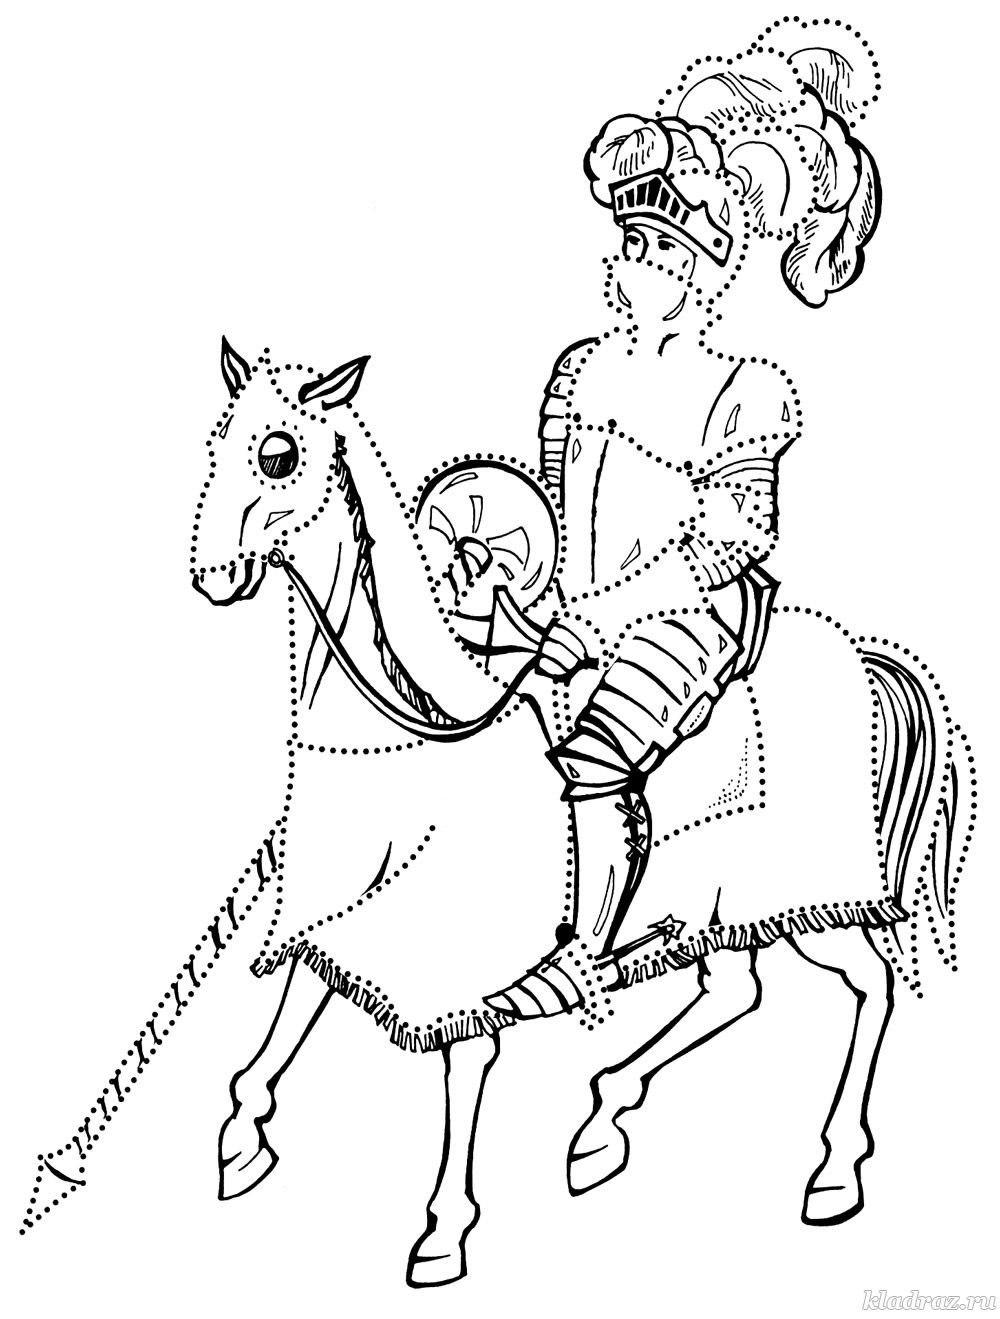 Раскраска для мальчиков. Рыцарь на коне